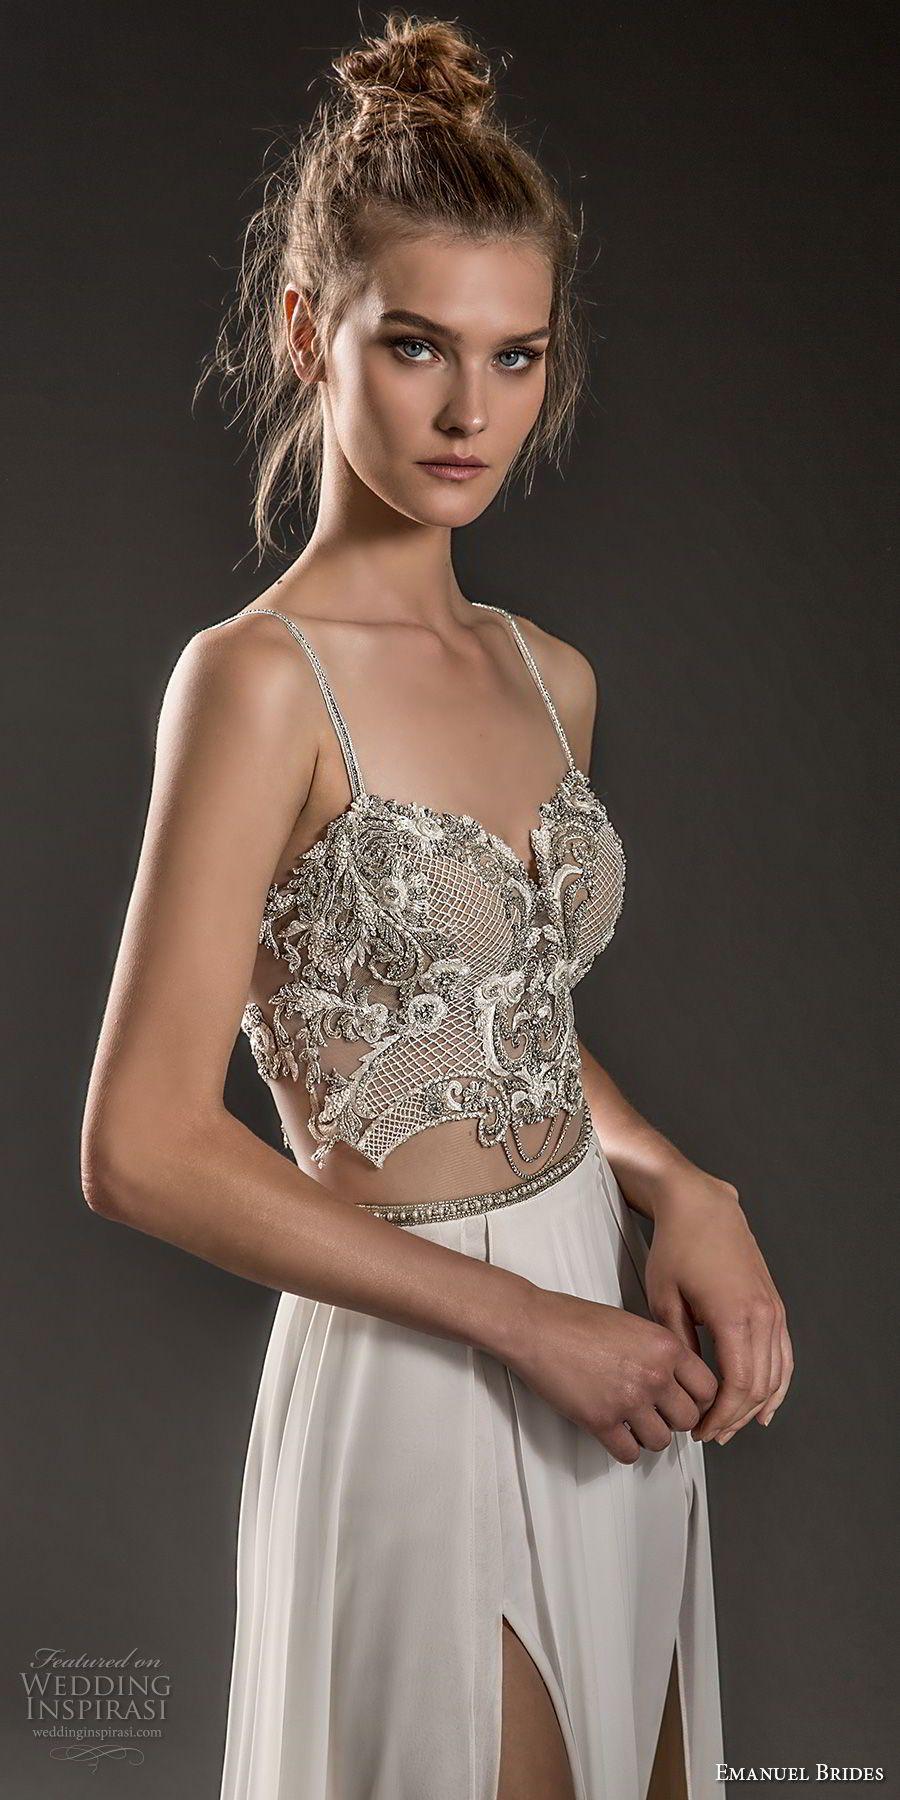 Emanuel brides wedding dresses bodice neckline and wedding dress